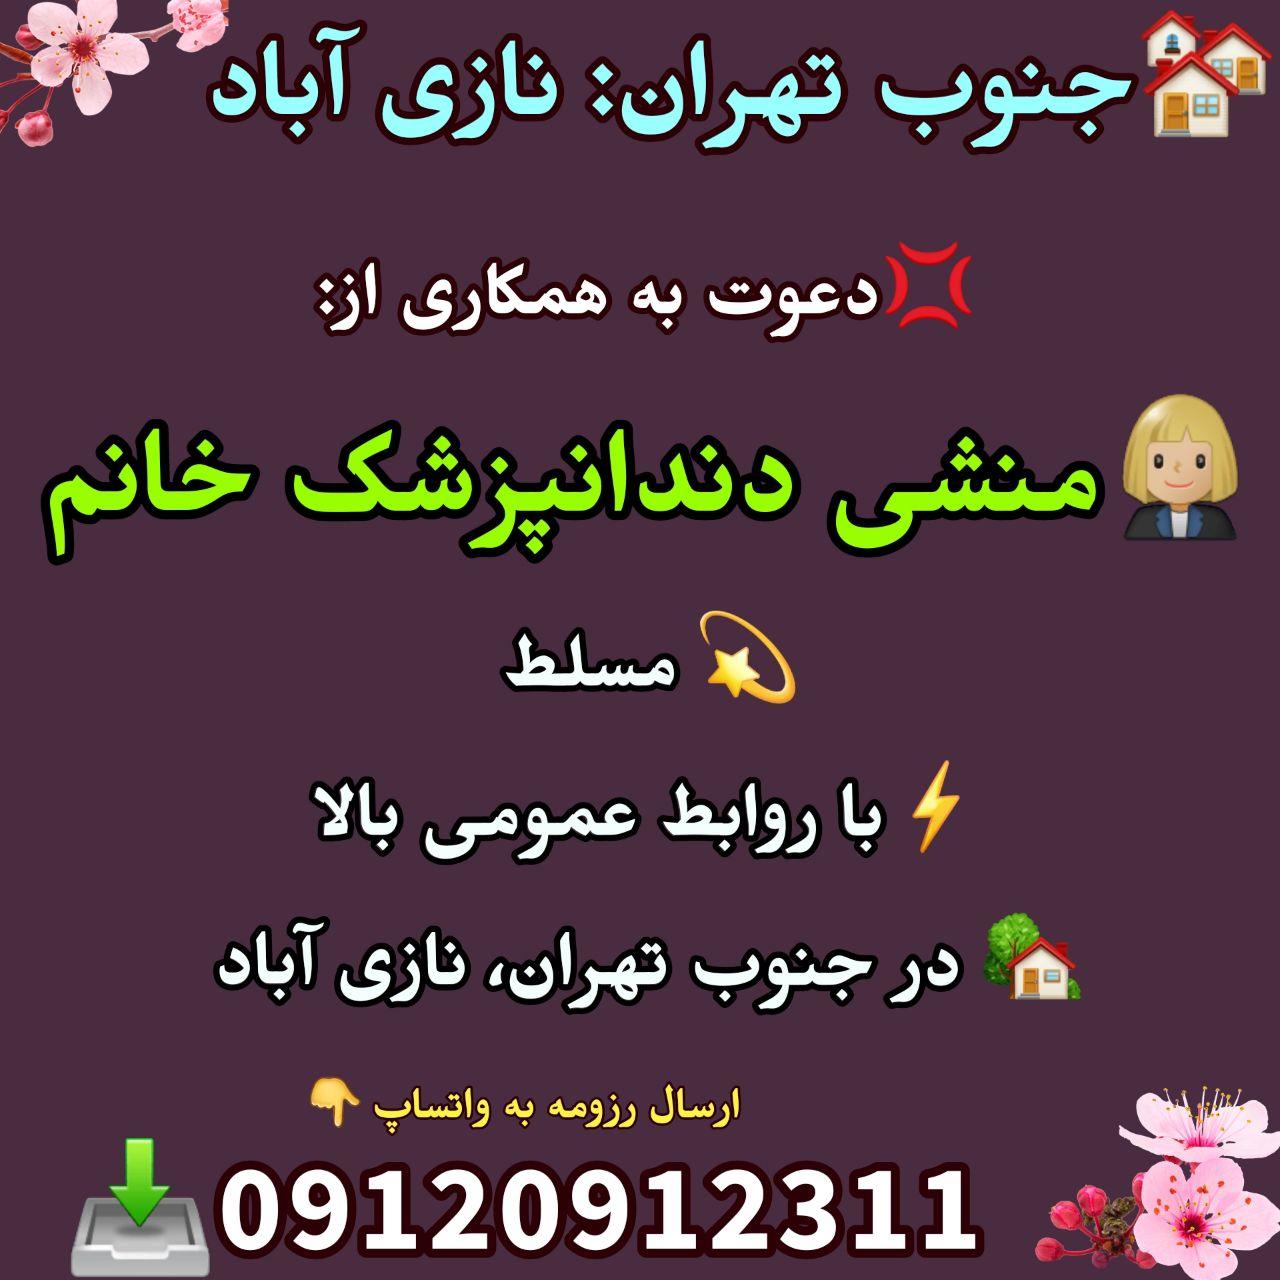 جنوب تهران: نازی آباد